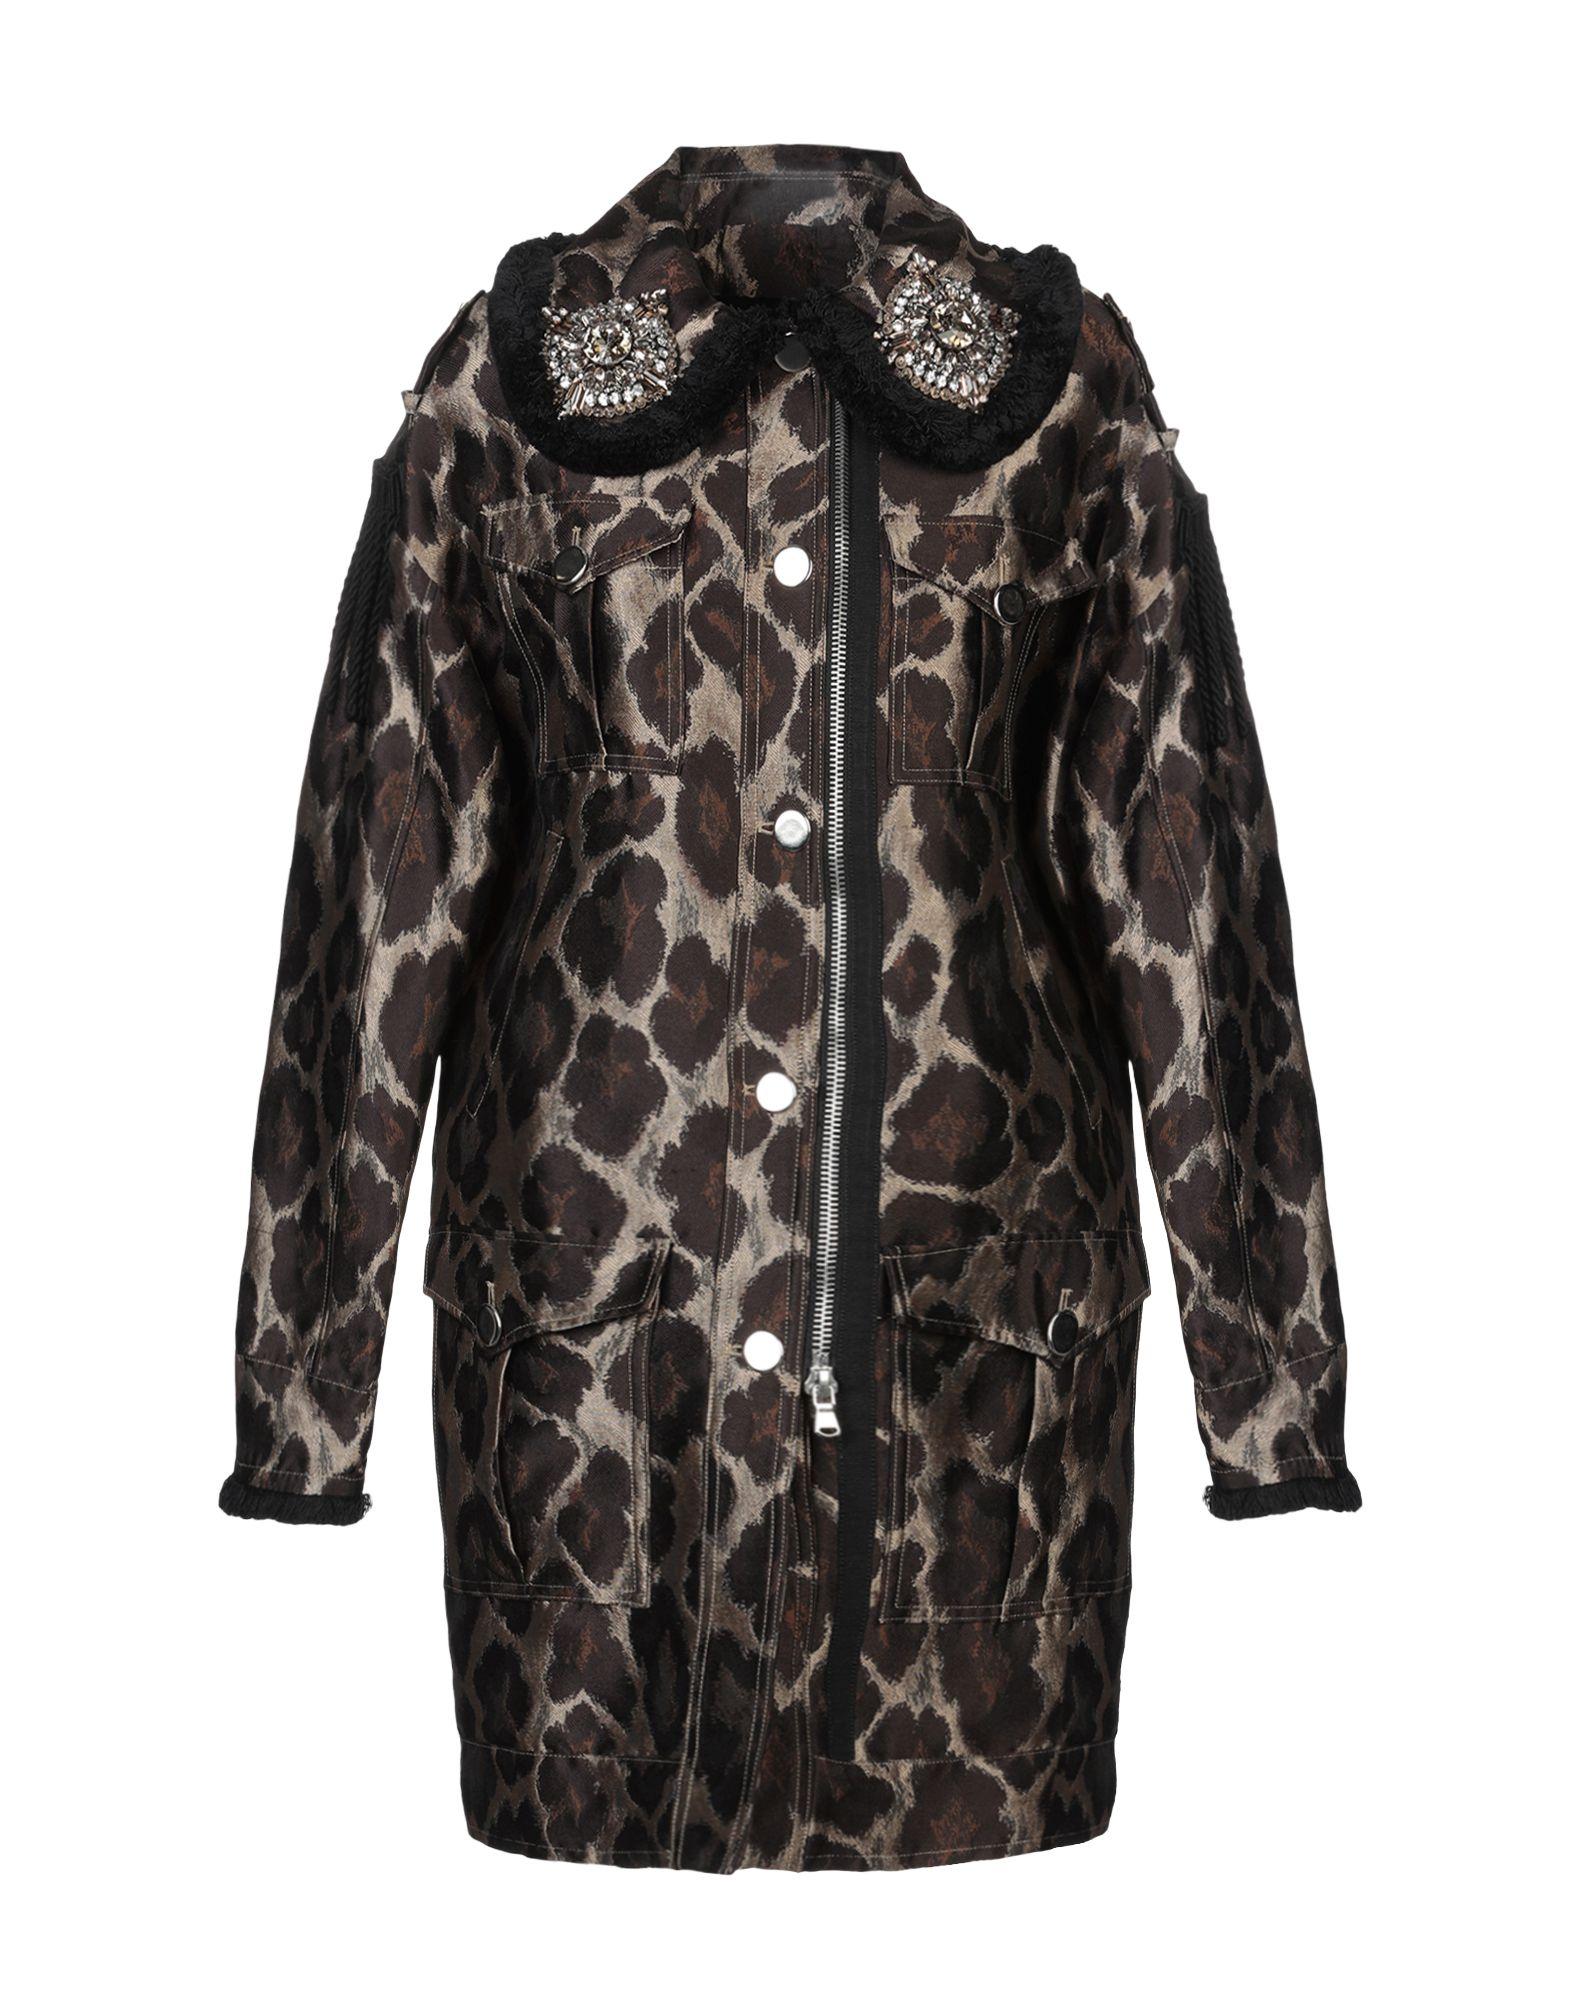 Фото - CHRISTIAN PELLIZZARI Пальто christian pellizzari блузка